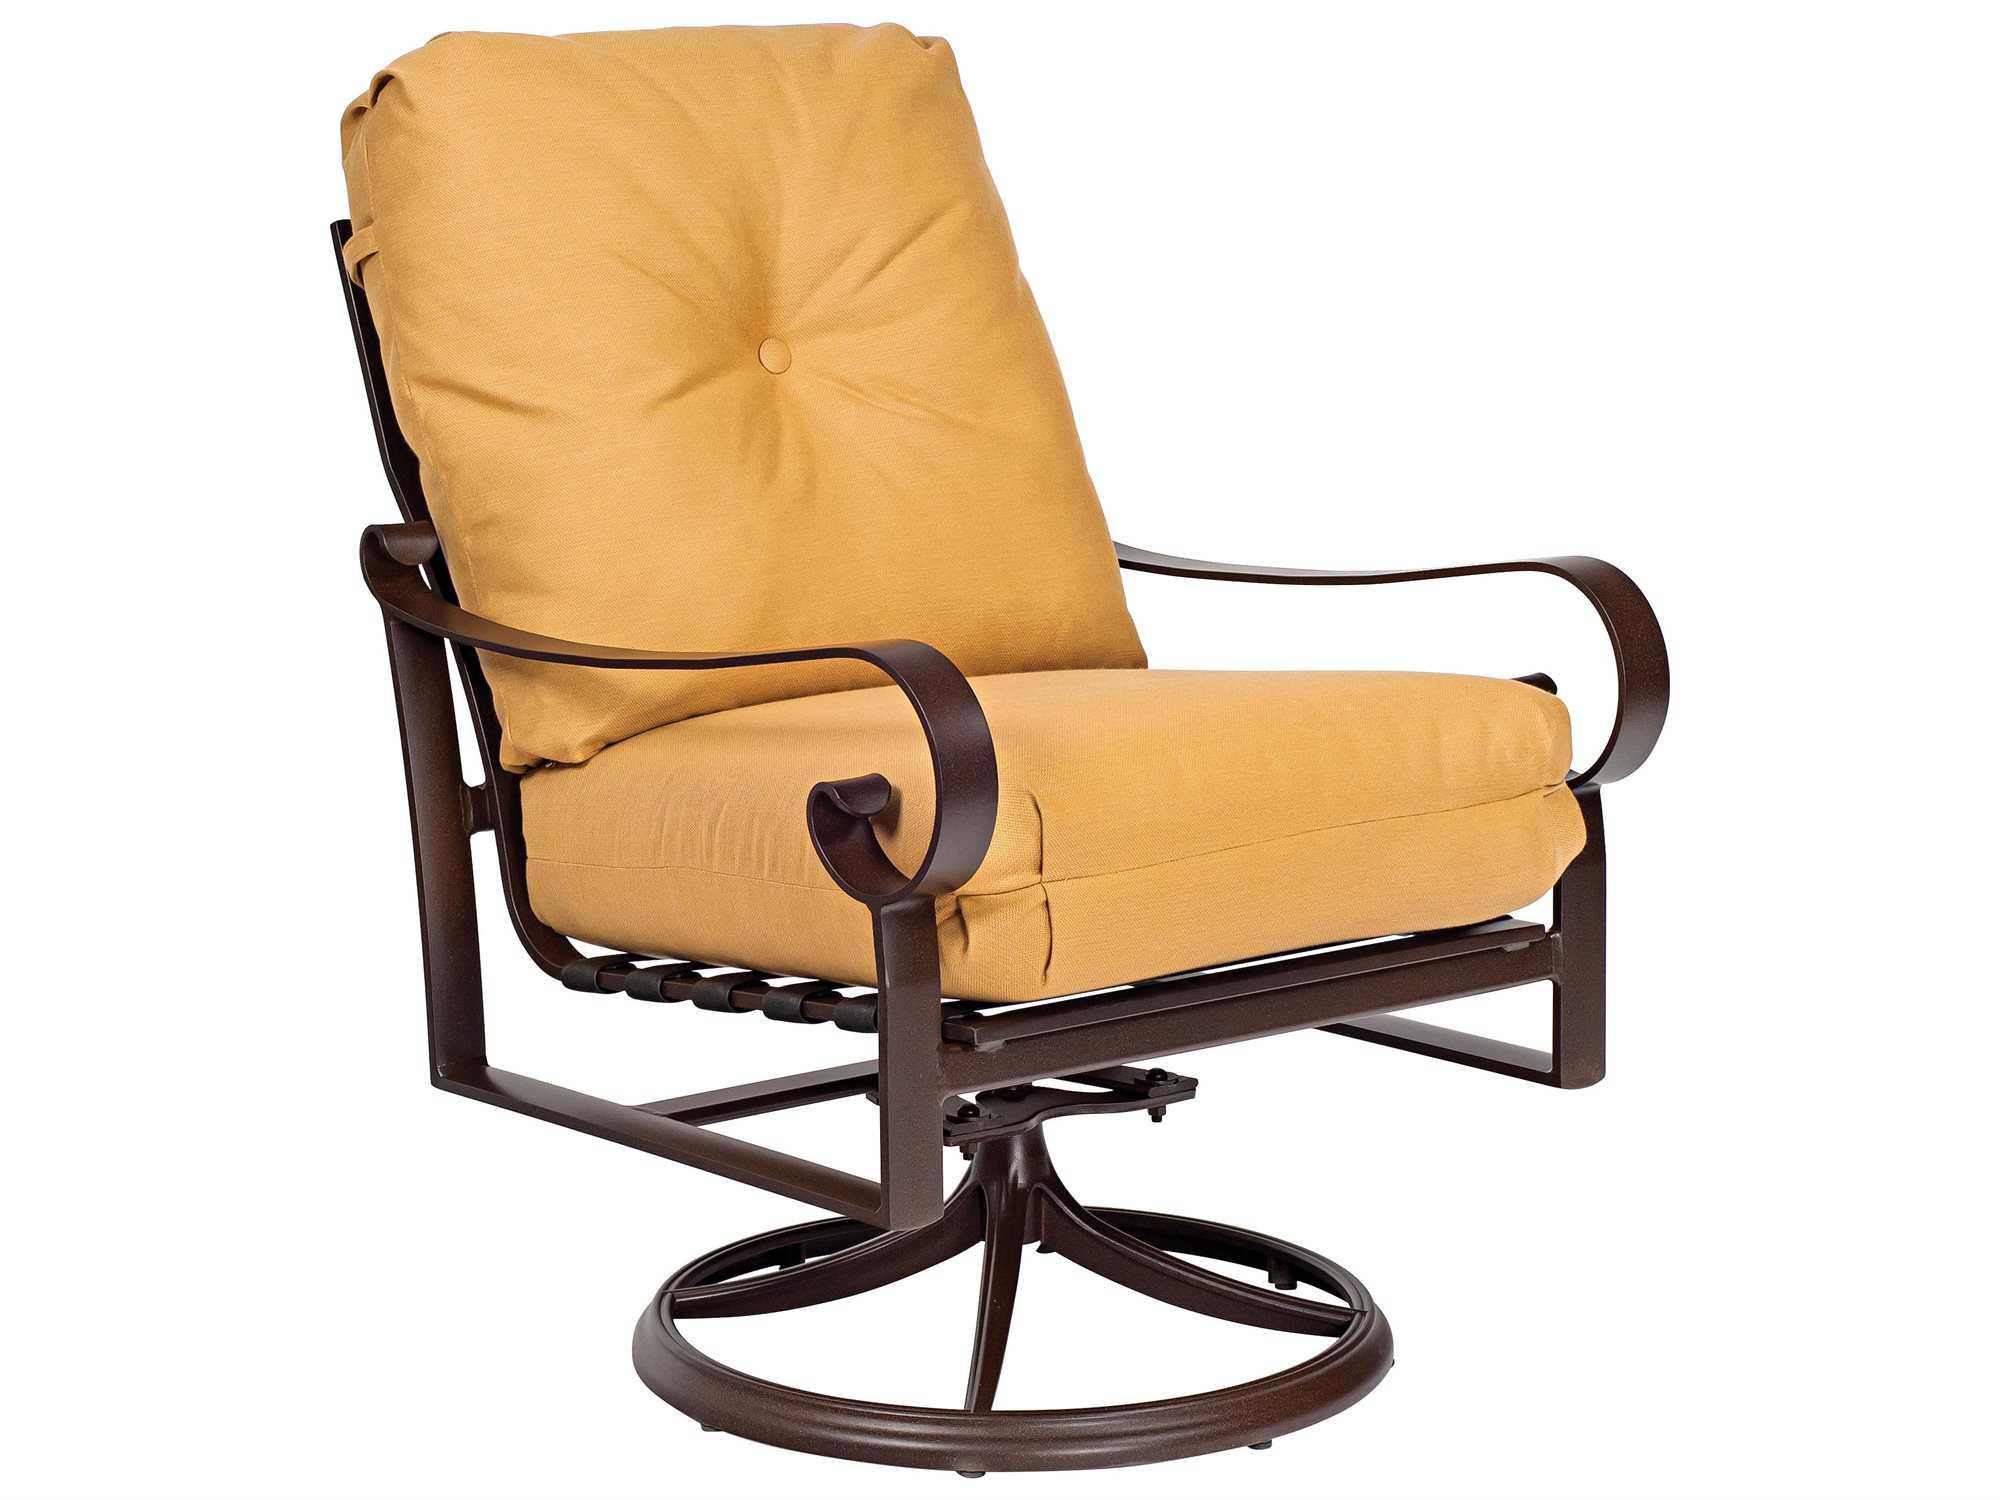 Woodard Belden Swivel Rocking Lounge Chair Replacement